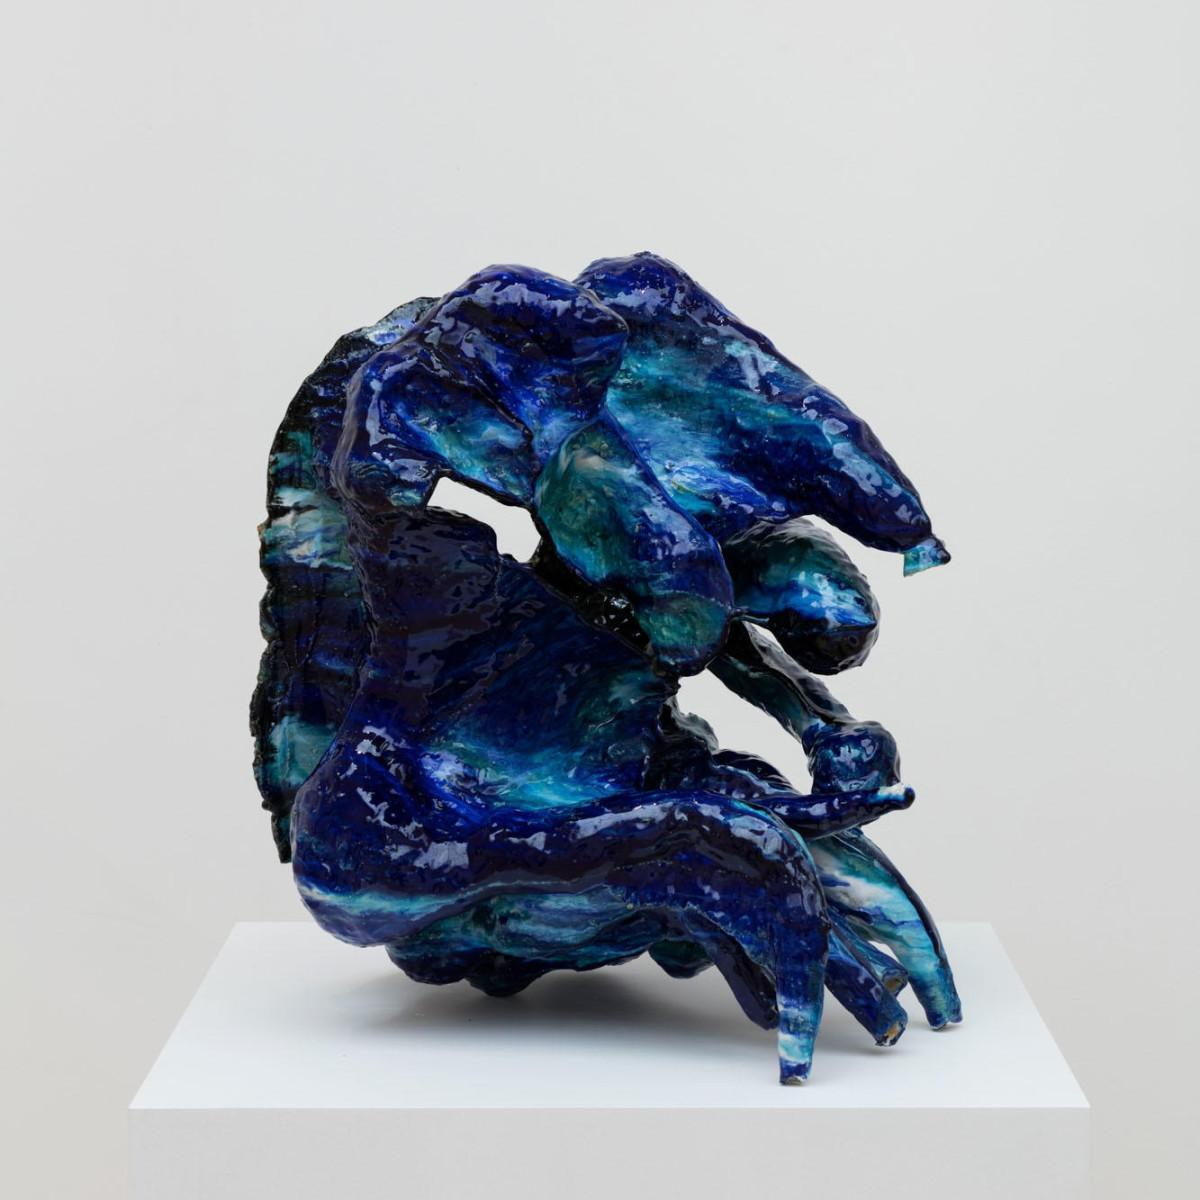 Marcelle Joseph Interviews Ceramic Artist Sebastian Stöhrer